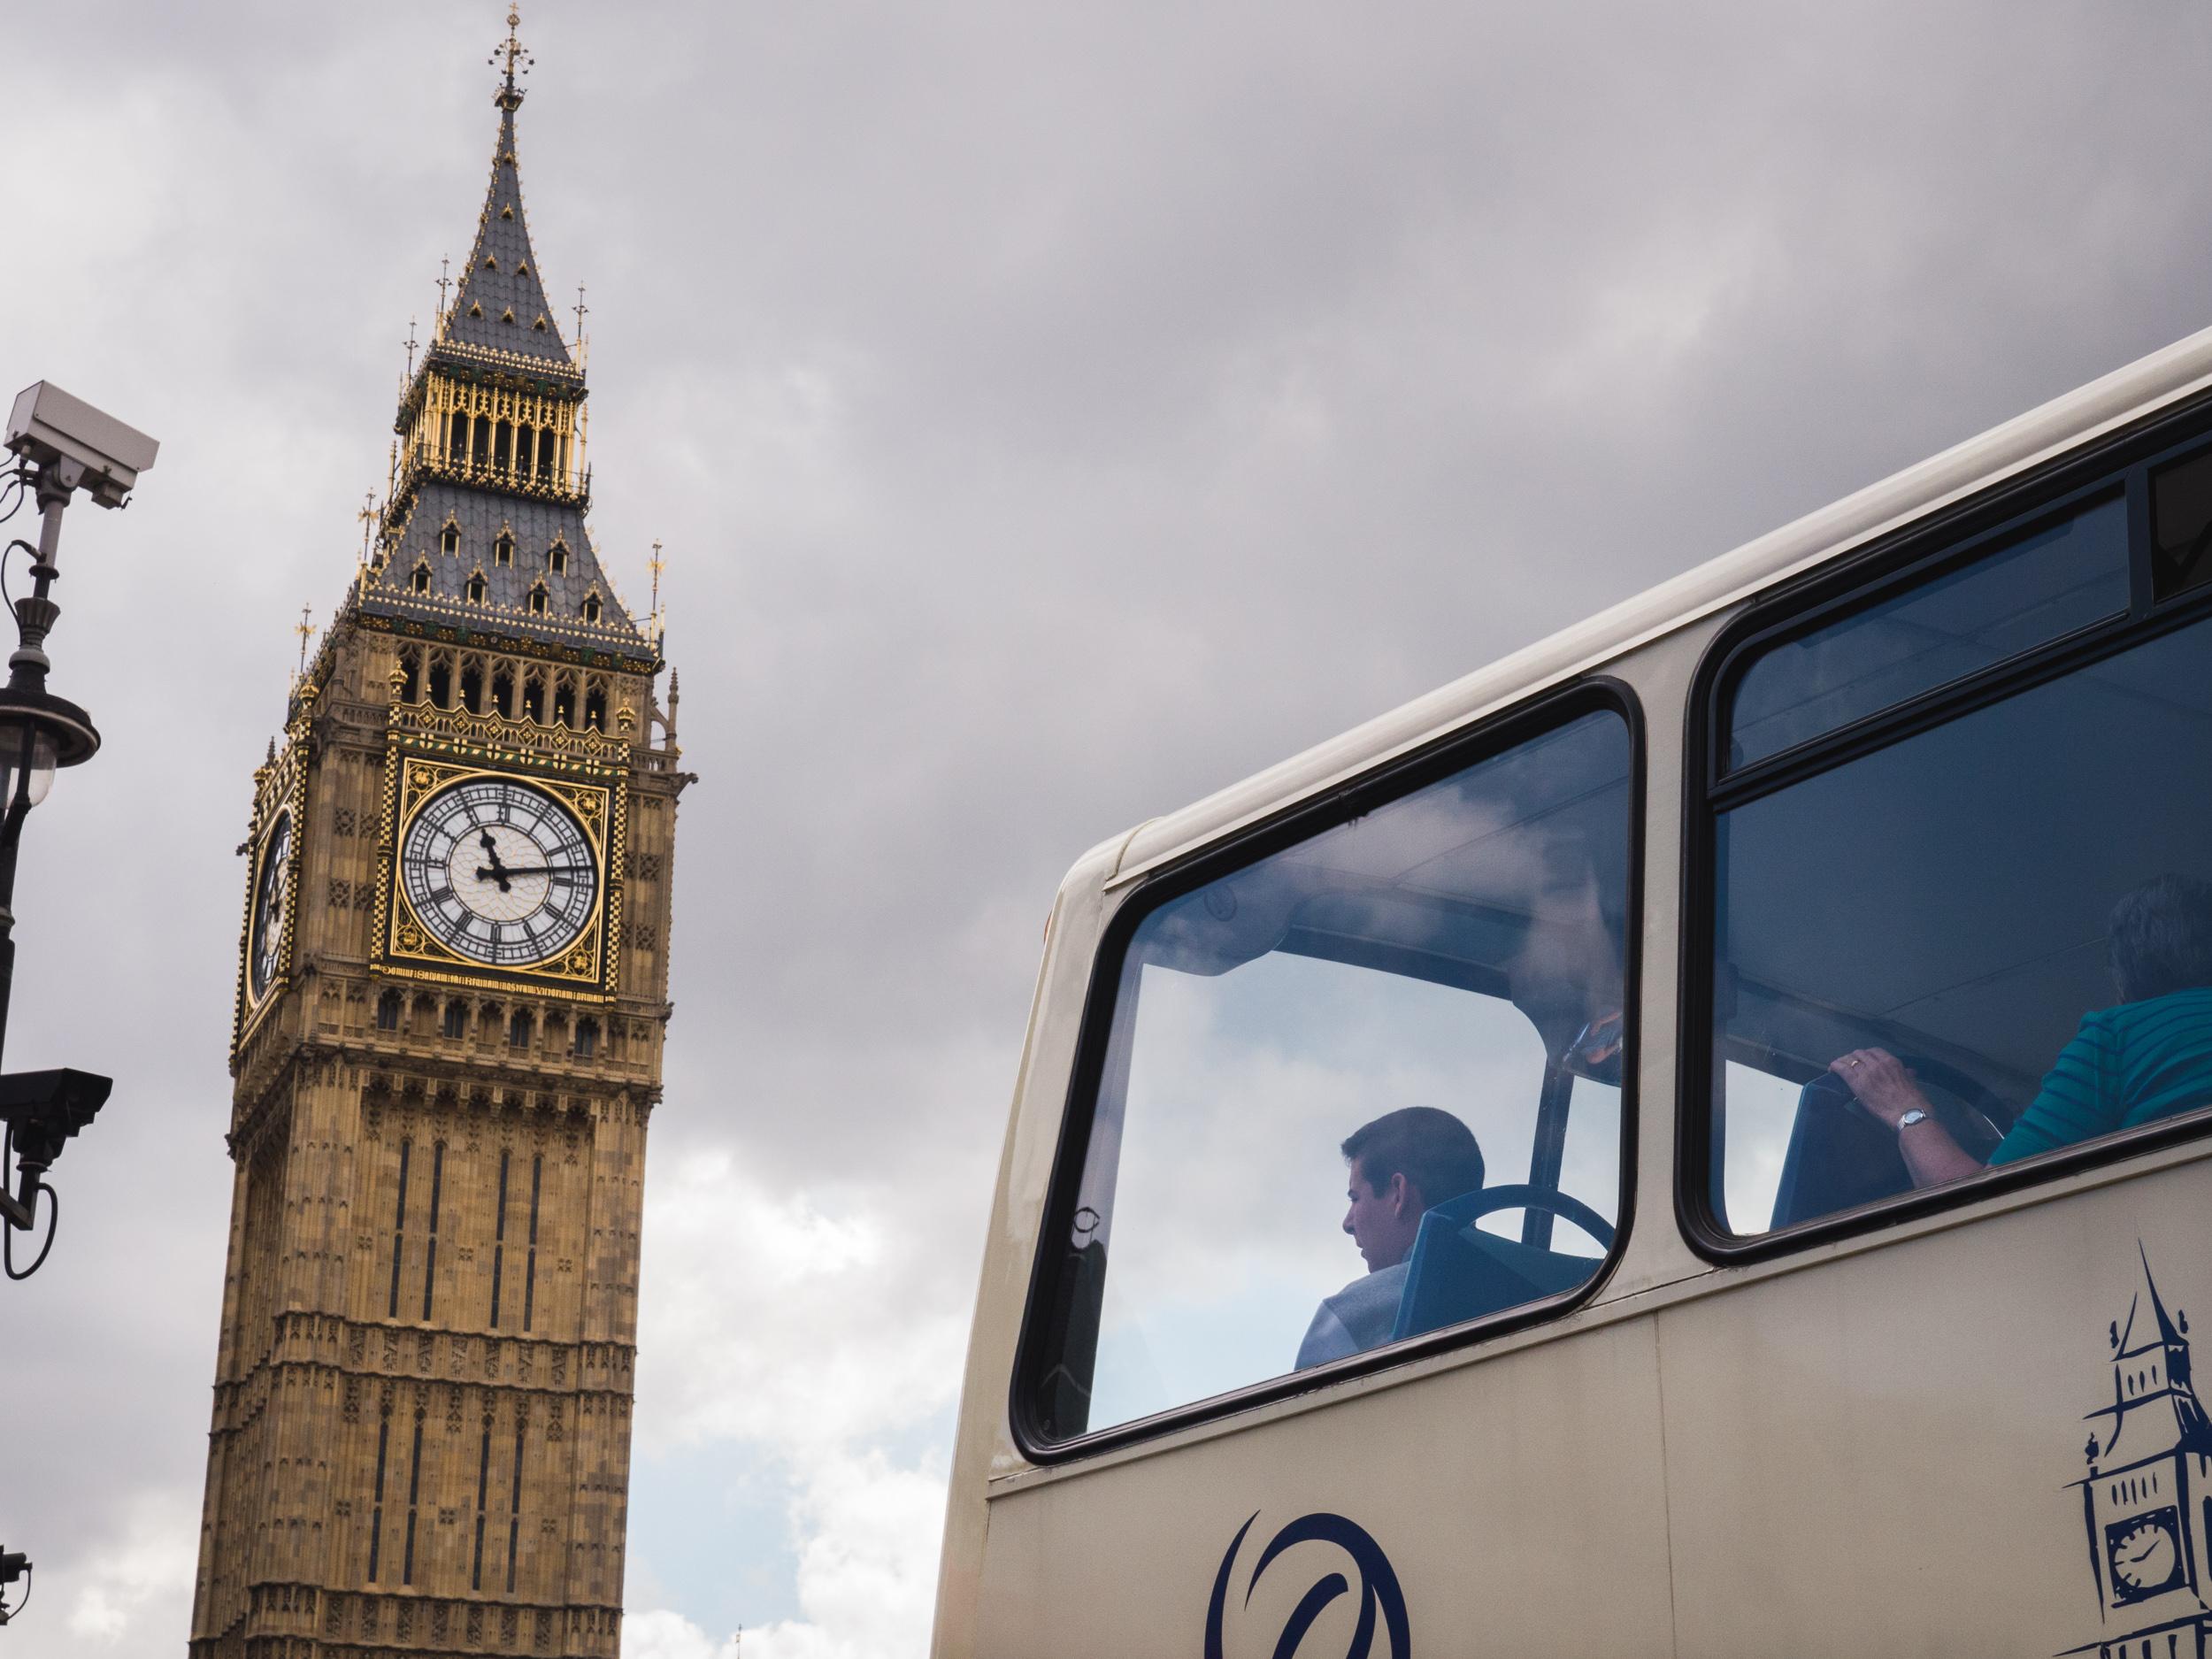 _10 London Bus Big ben and Eye.jpg